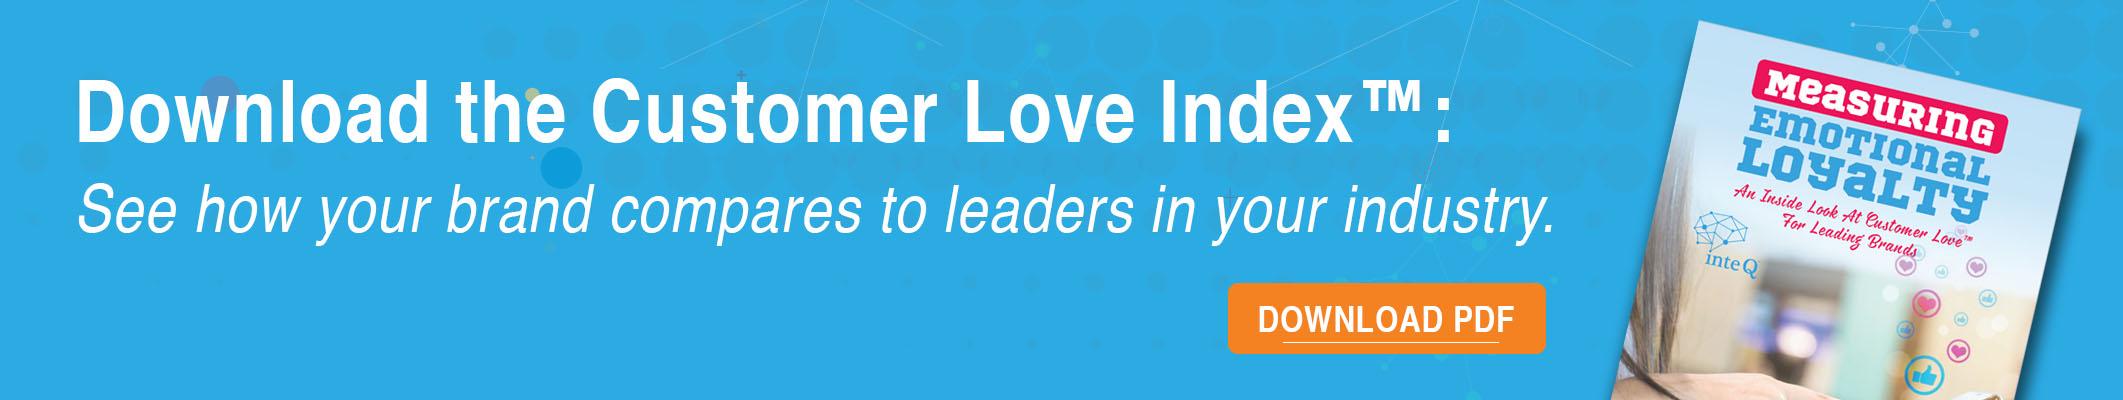 Download Customer Love Index, inte q